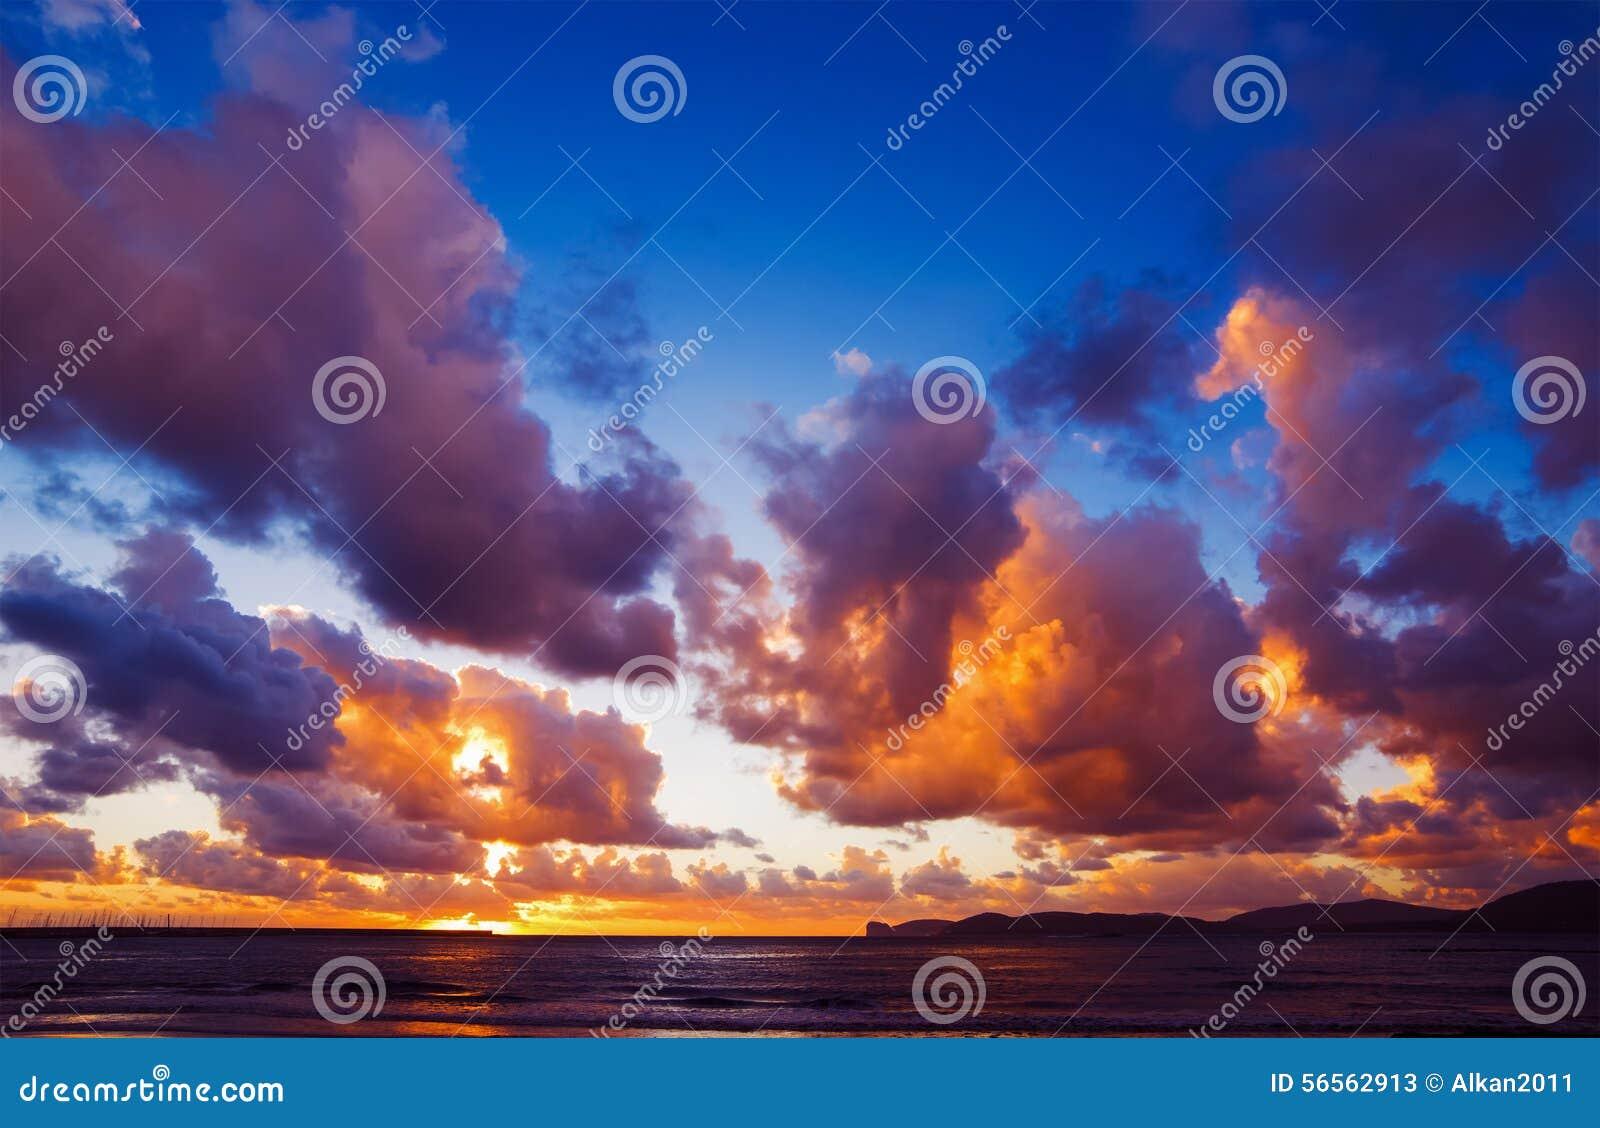 Download Δραματικός ουρανός πέρα από την ακτή Alghero στο ηλιοβασίλεμα Στοκ Εικόνα - εικόνα από πρωί, σαρδηνία: 56562913